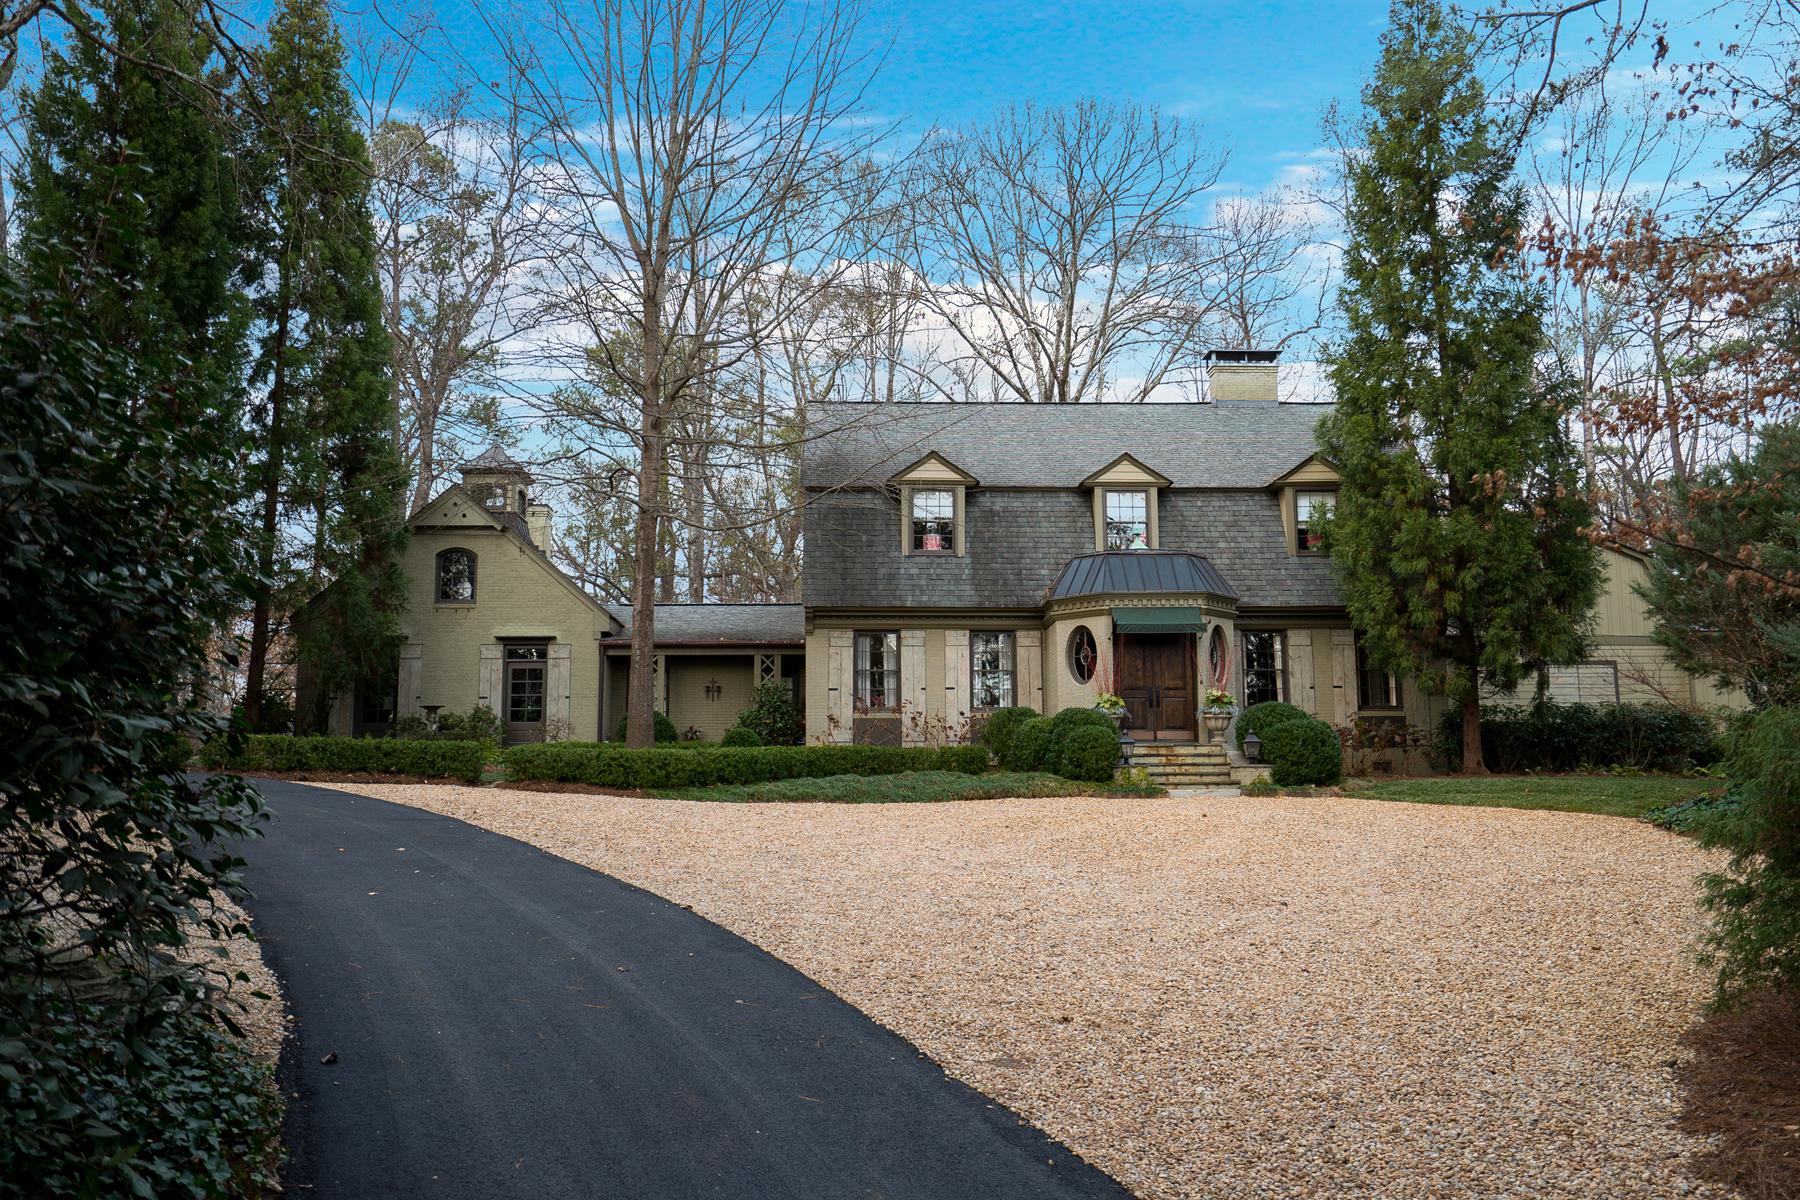 Nhà ở một gia đình vì Bán tại Sophisticated Chastain Park Home 537 Hillside Drive NW Chastain Park, Atlanta, Georgia, 30342 Hoa Kỳ